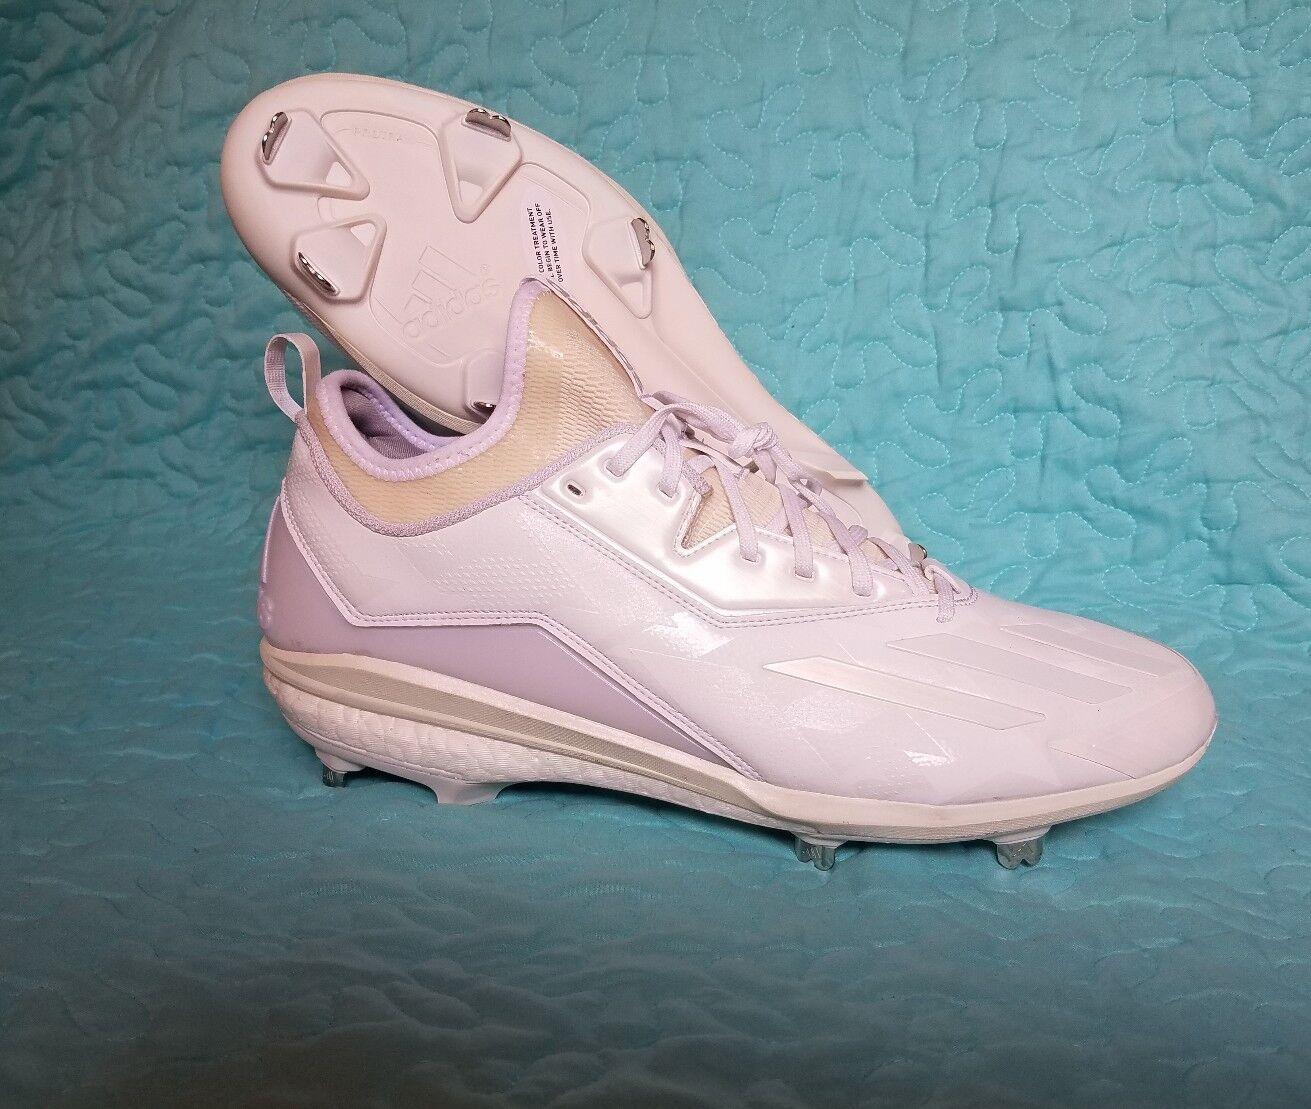 78c18836d Adidas Icon Men s Baseball Cleats - Cloud White Silver Metallic B27499 2.0  Boost ndaler654-Men s Athletic Shoes